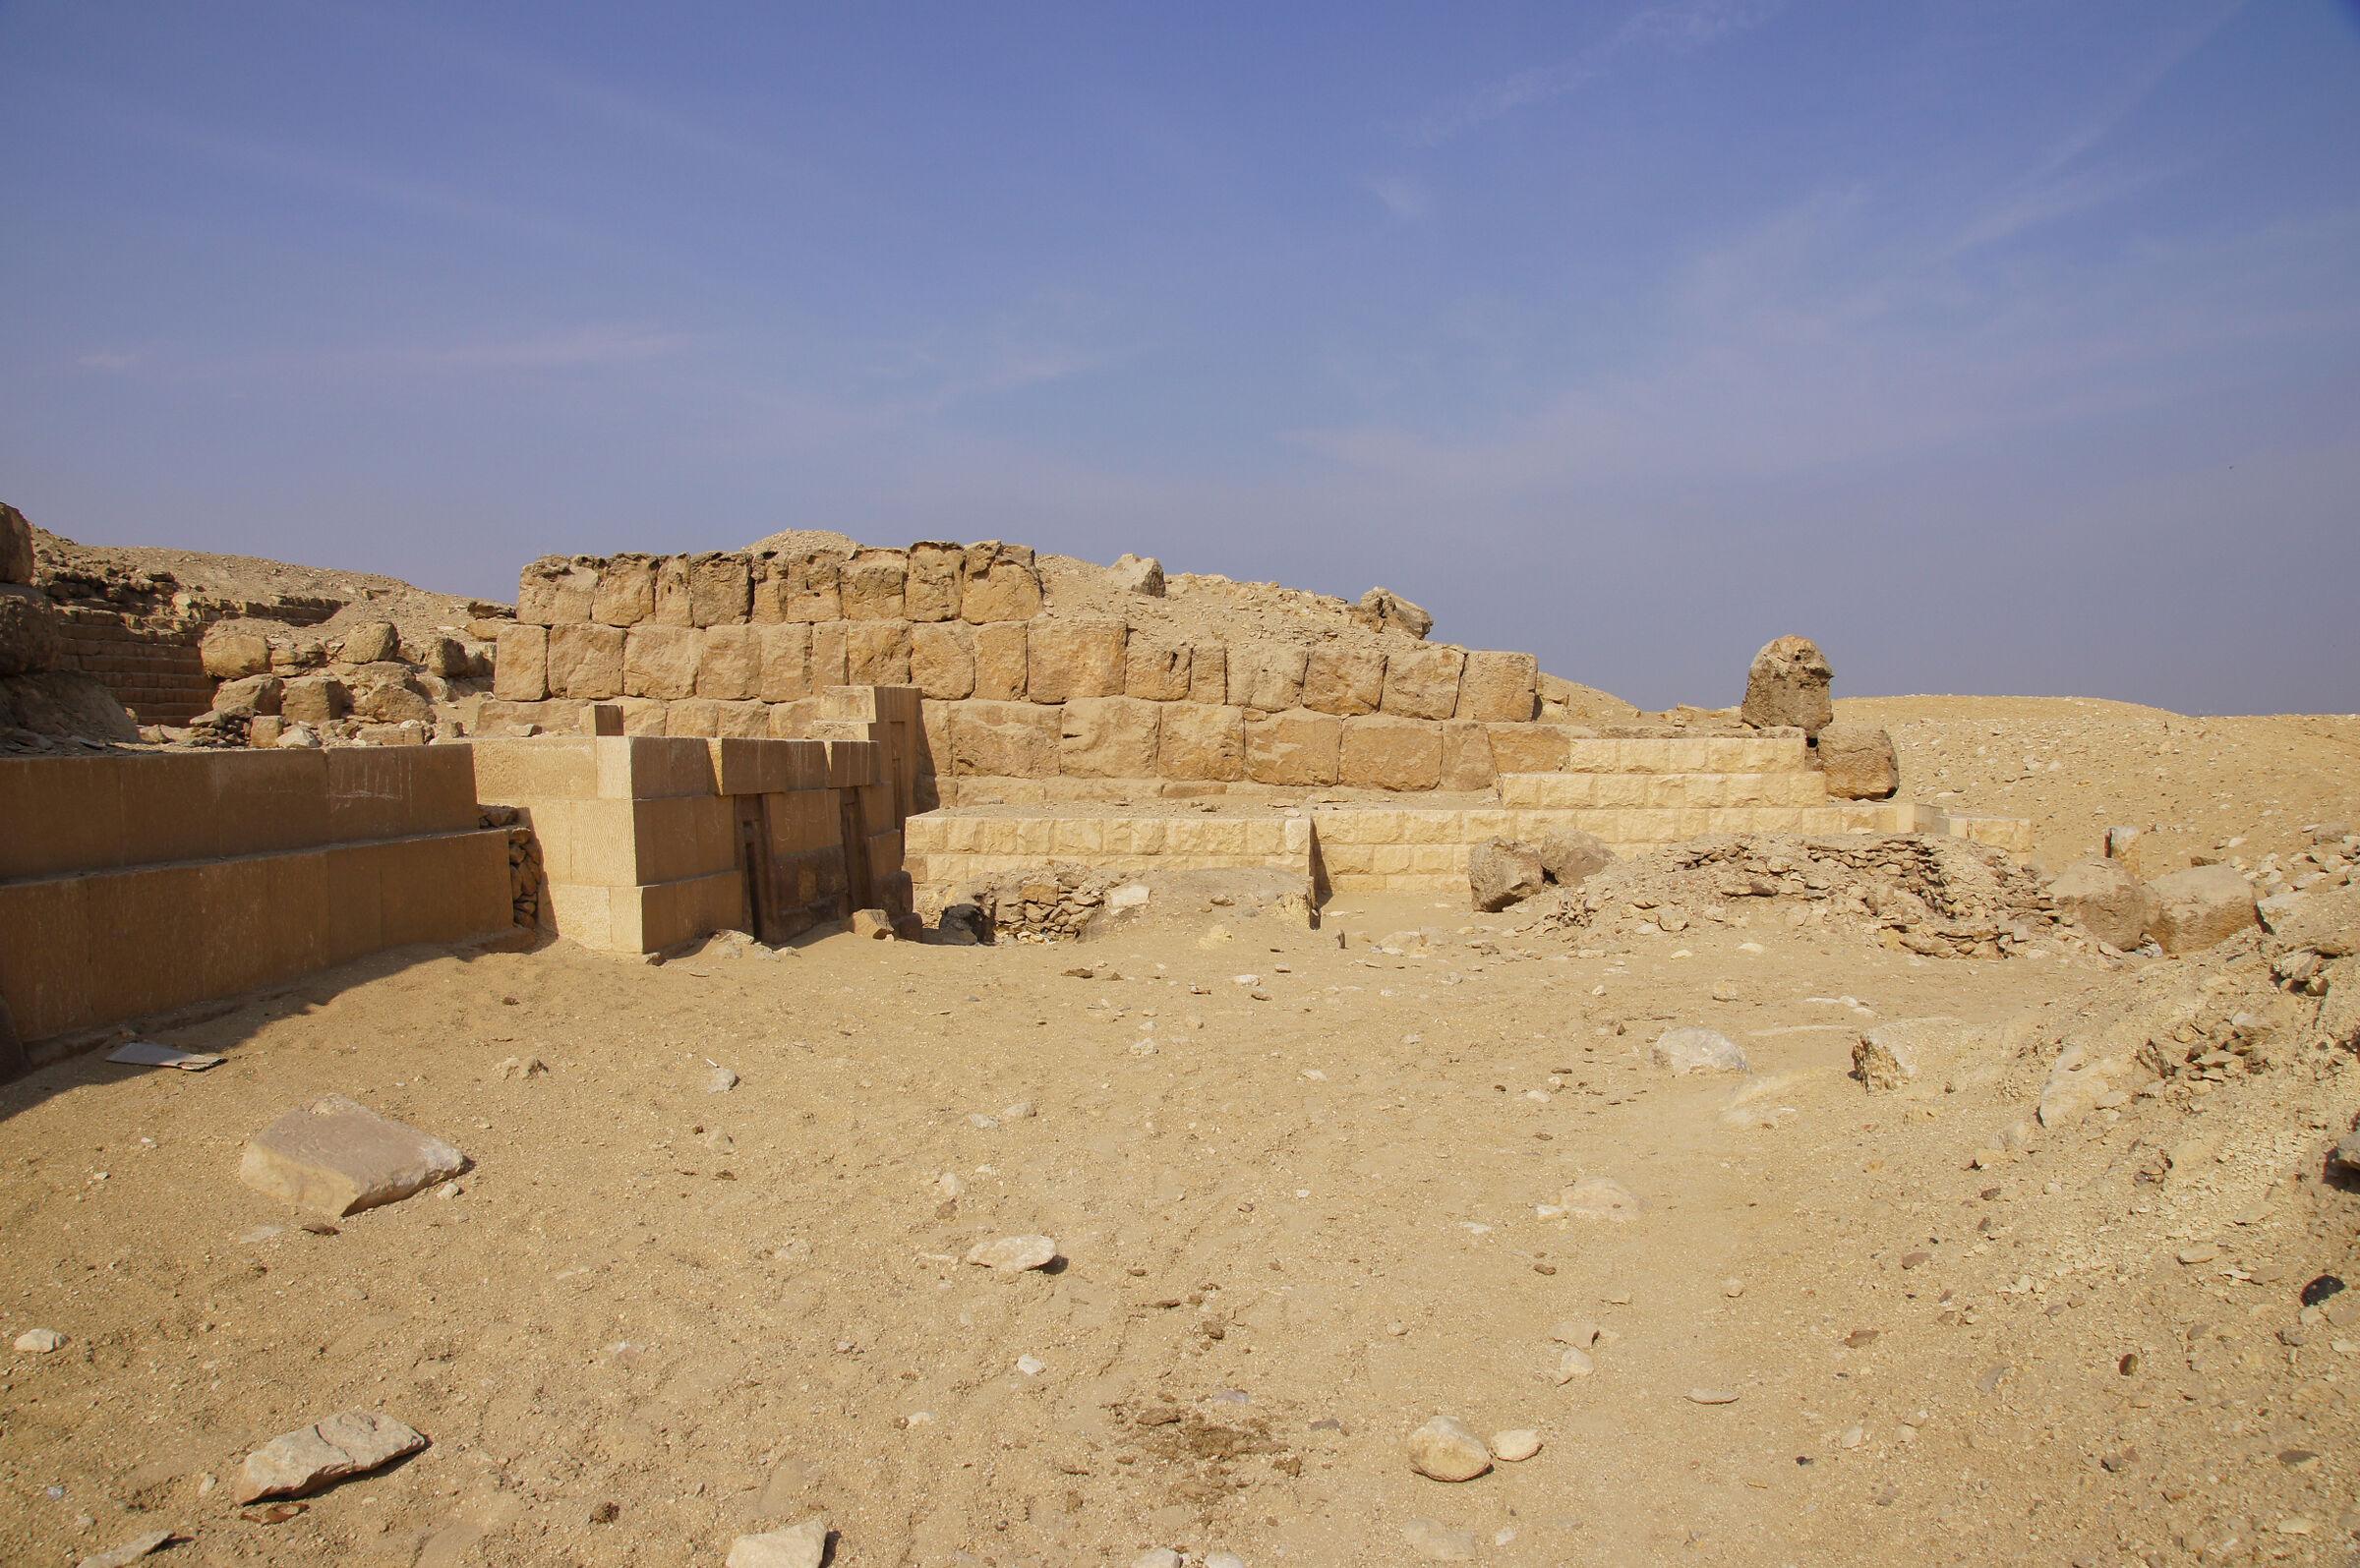 Western Cemetery: Site: Giza; View: G 2150, G 2151, G 2134, G 2138, G 2220